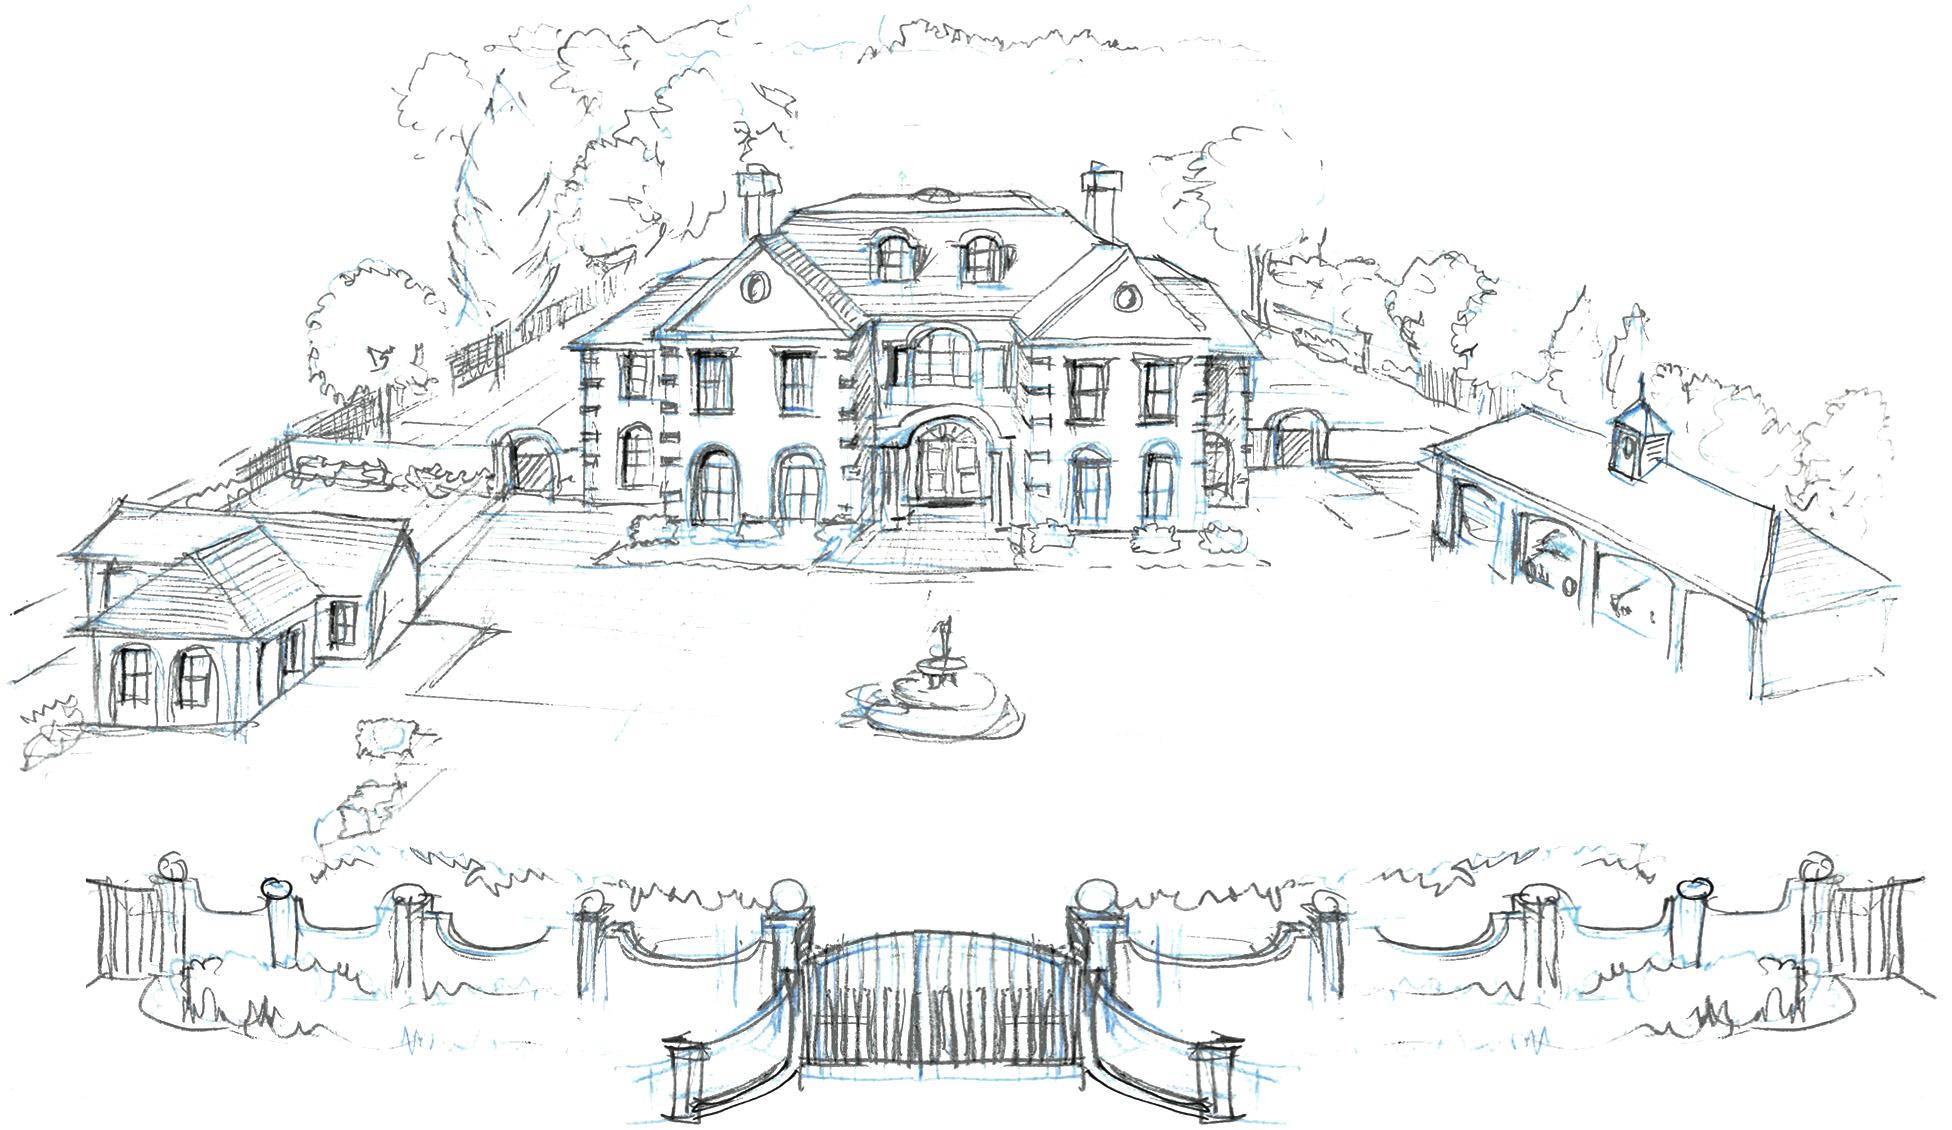 Hand drawn sketch by Andrew Scott